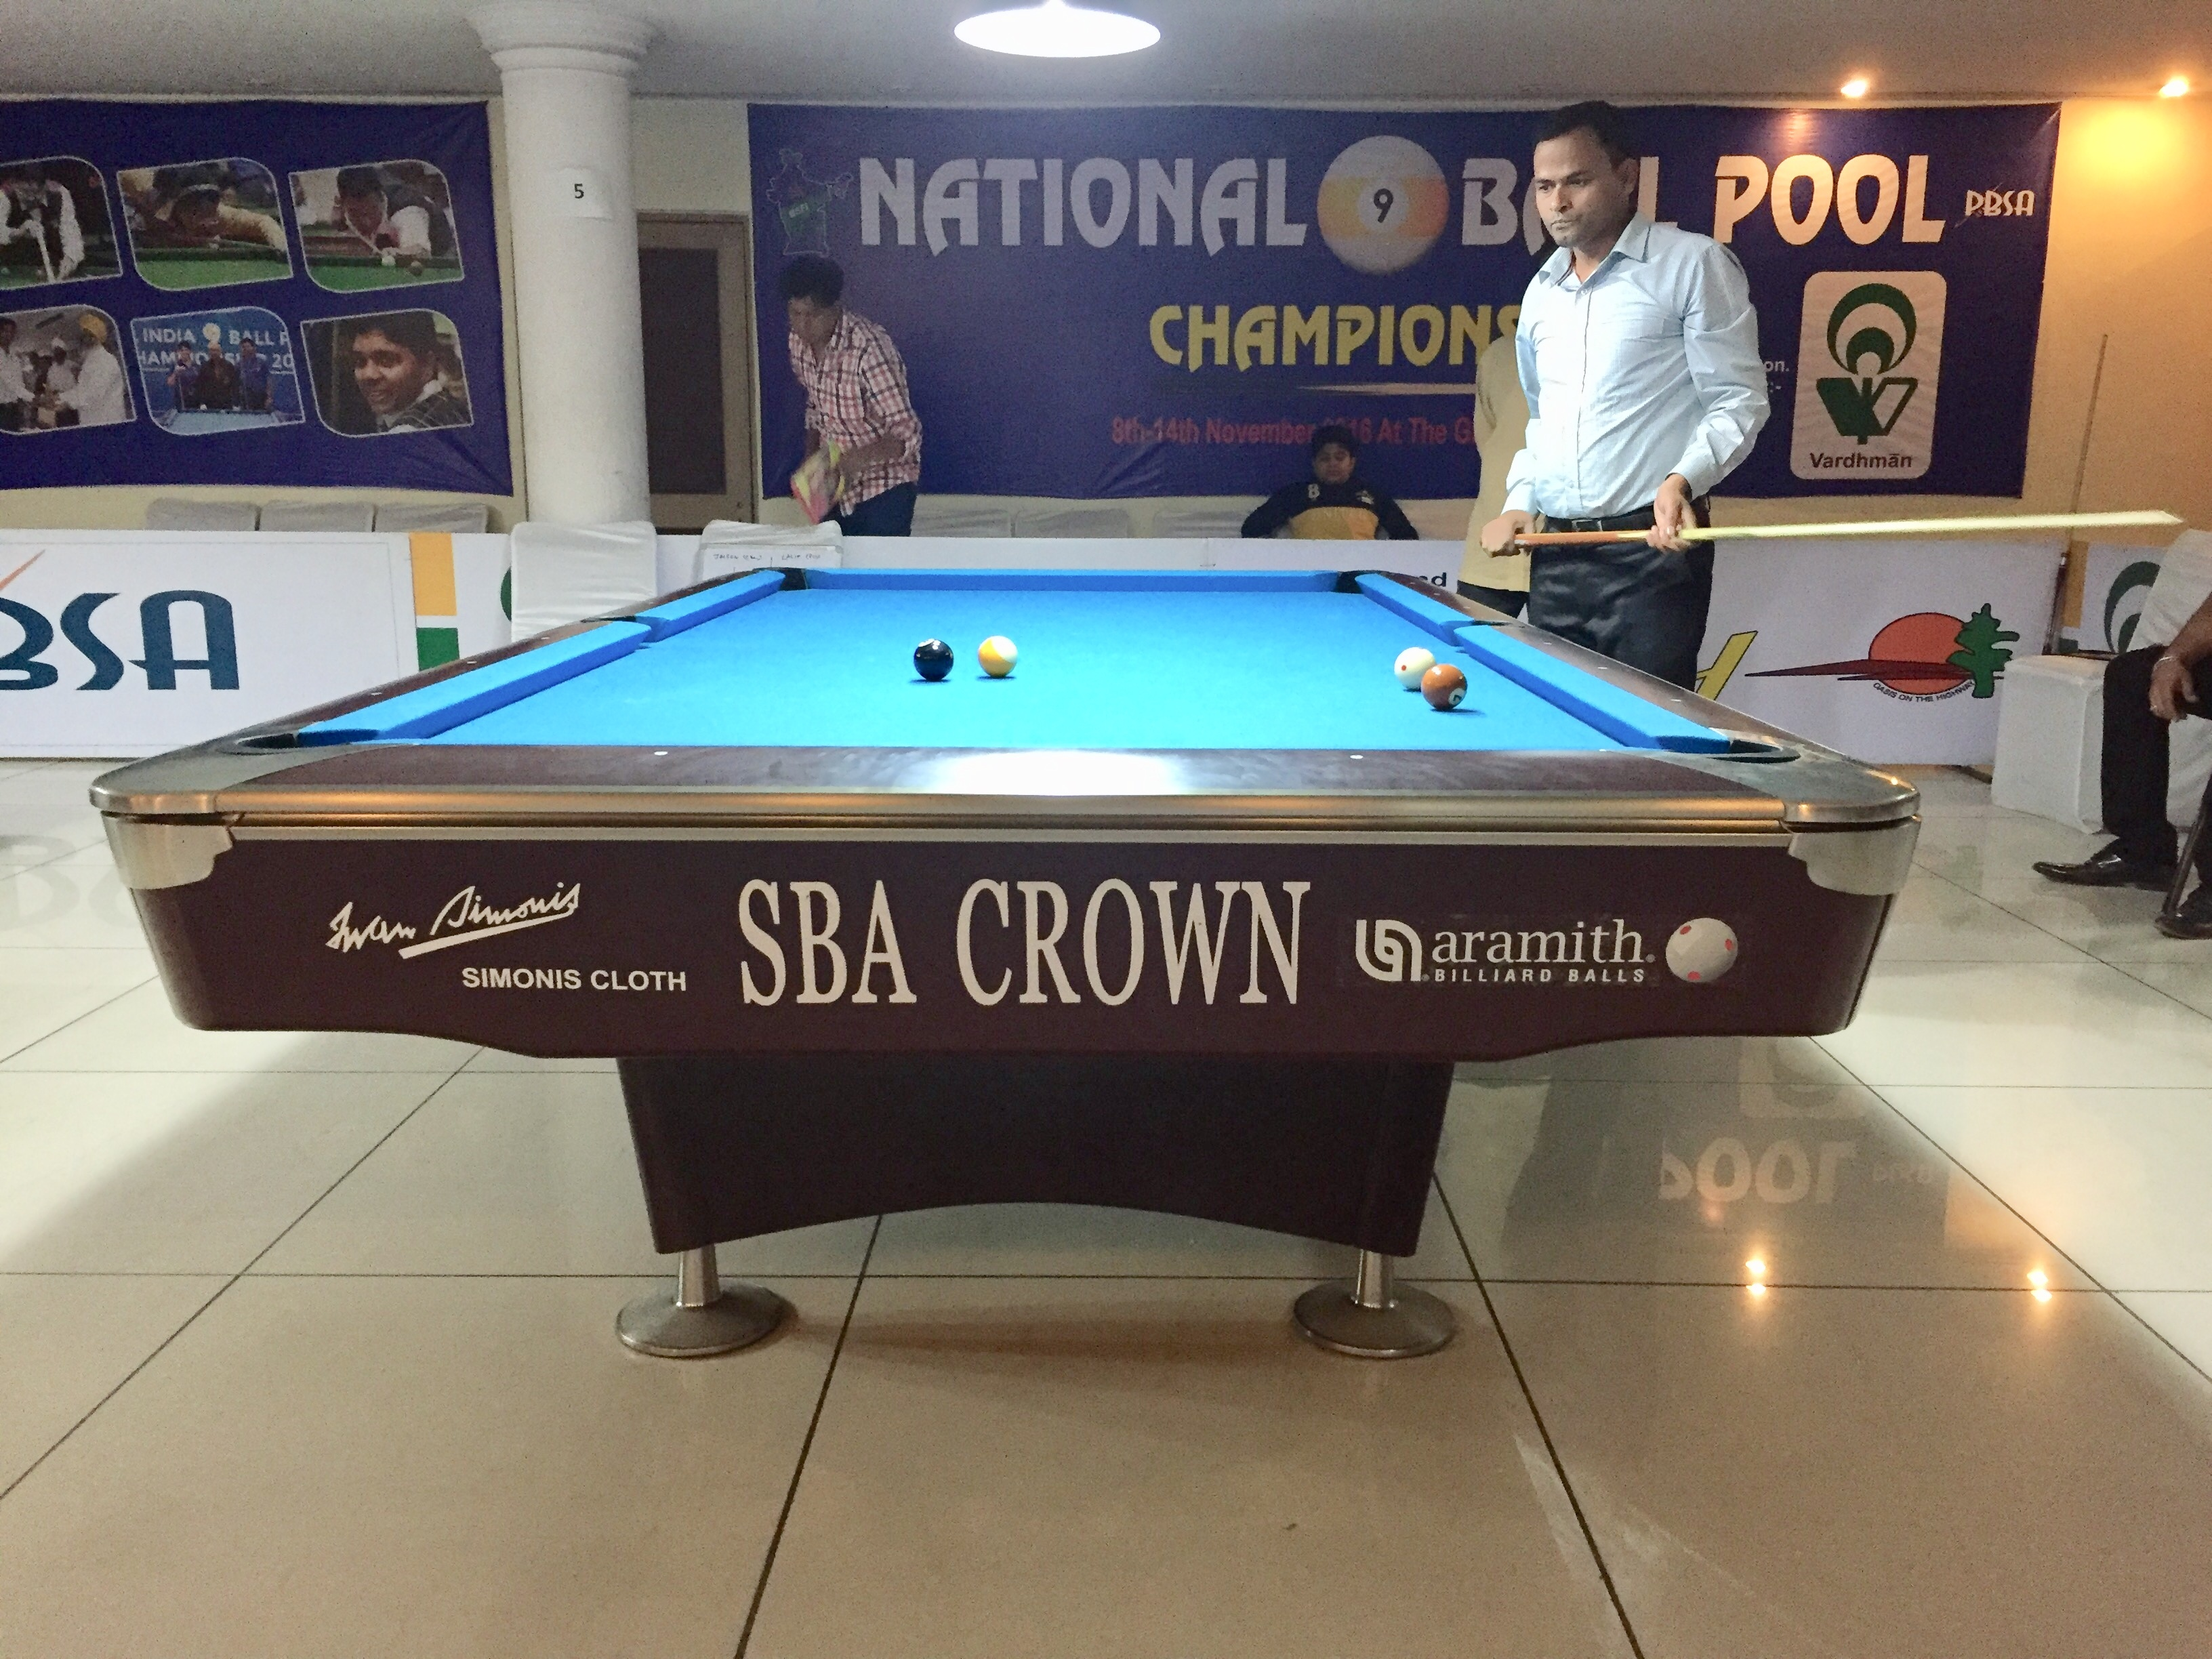 SBA Crown 7' Imported American Pool Table